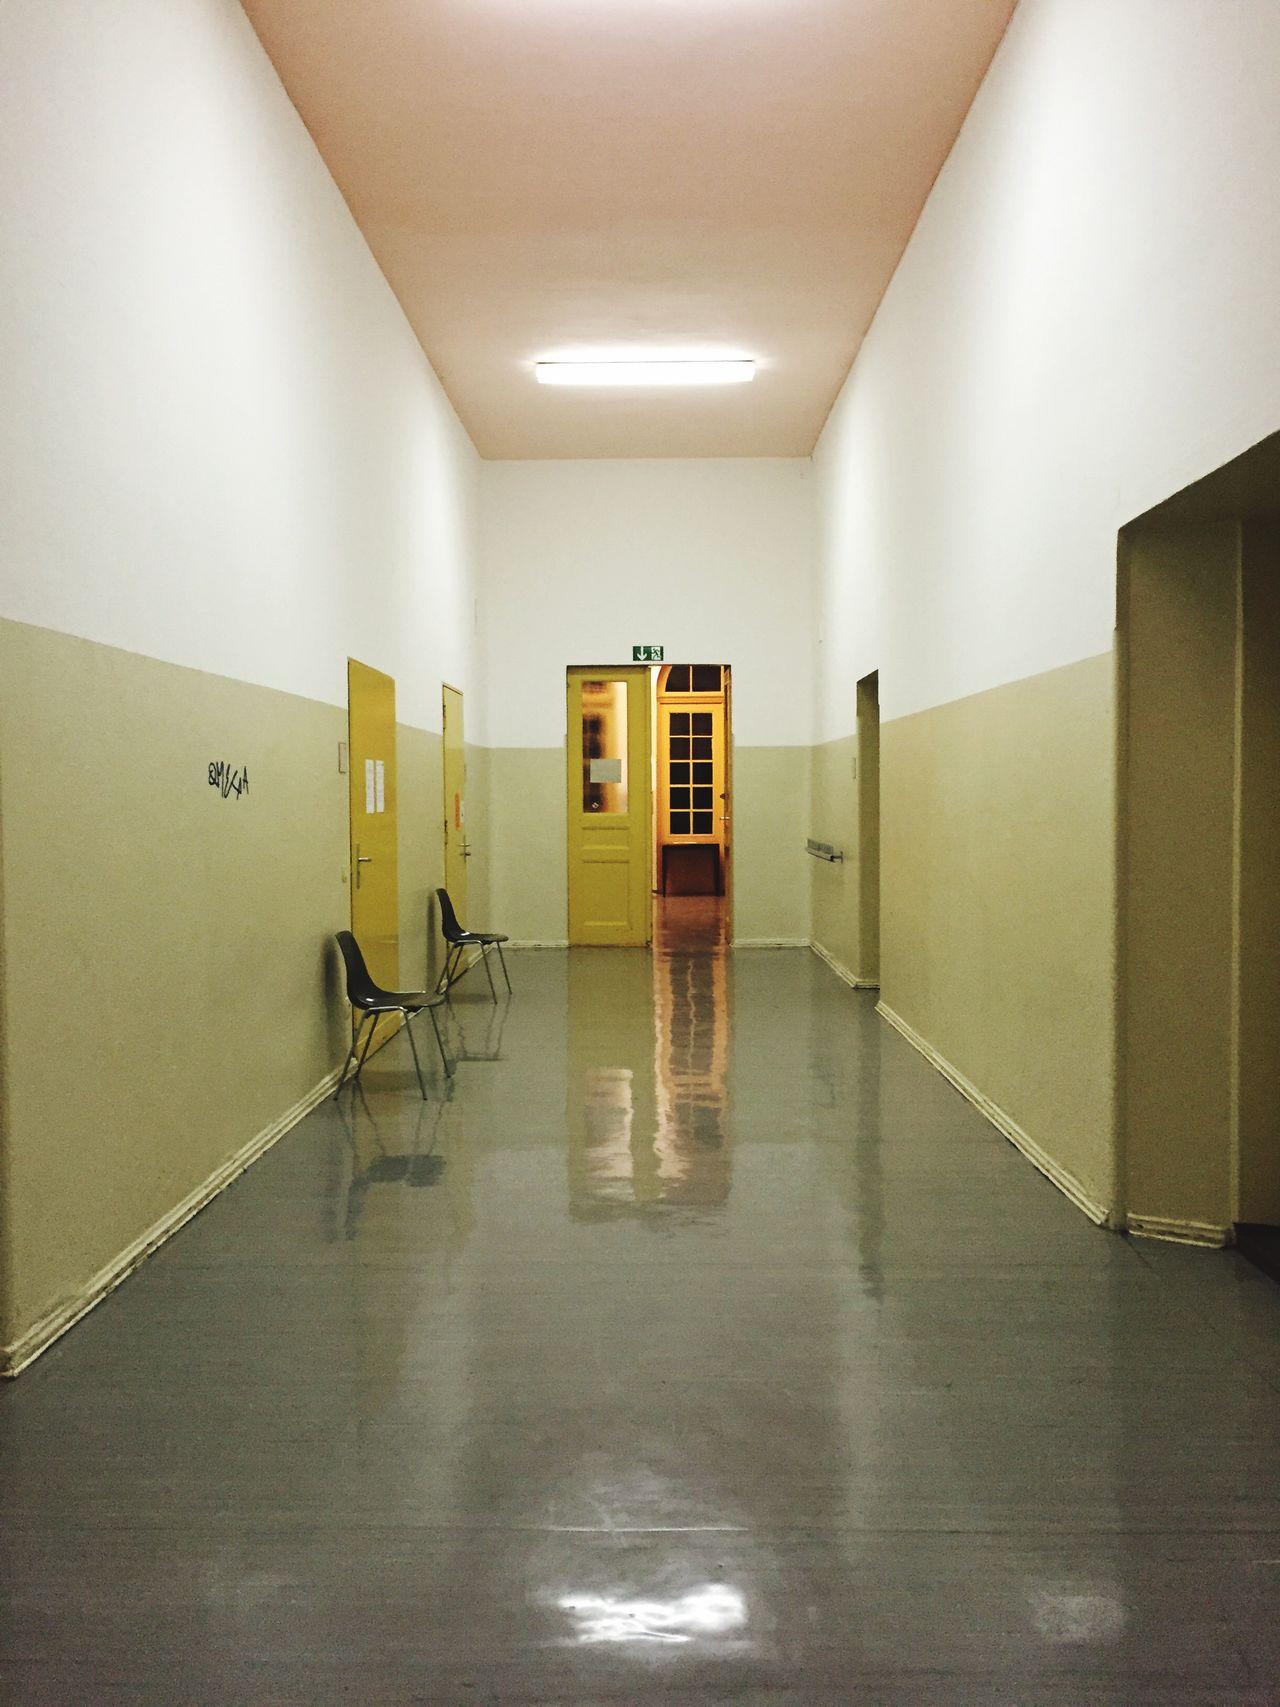 Hallway Minimalism Simplicity Interior Design Architecture